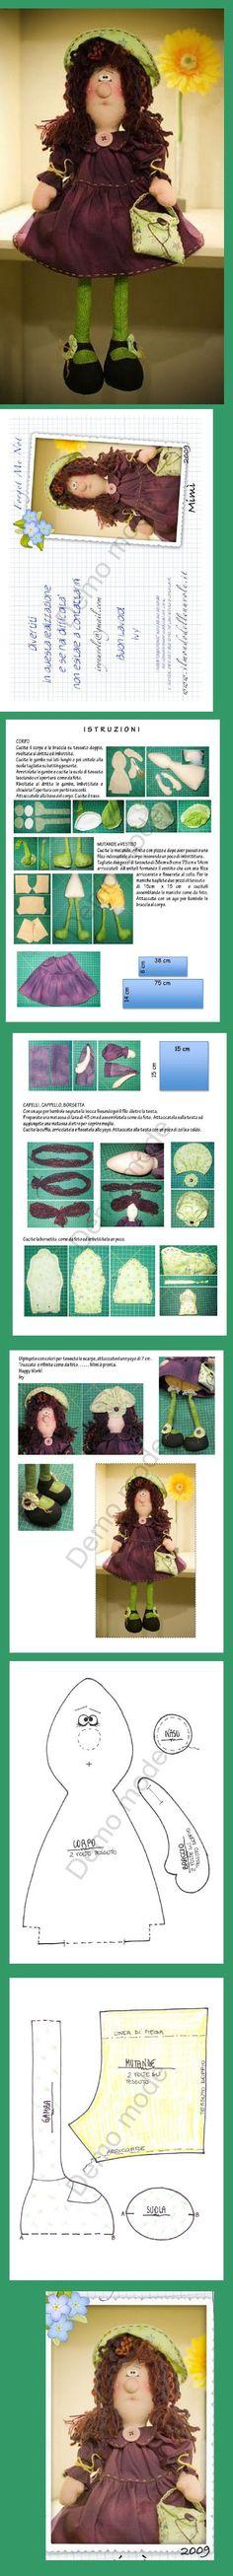 cloth doll pattern & tutorial